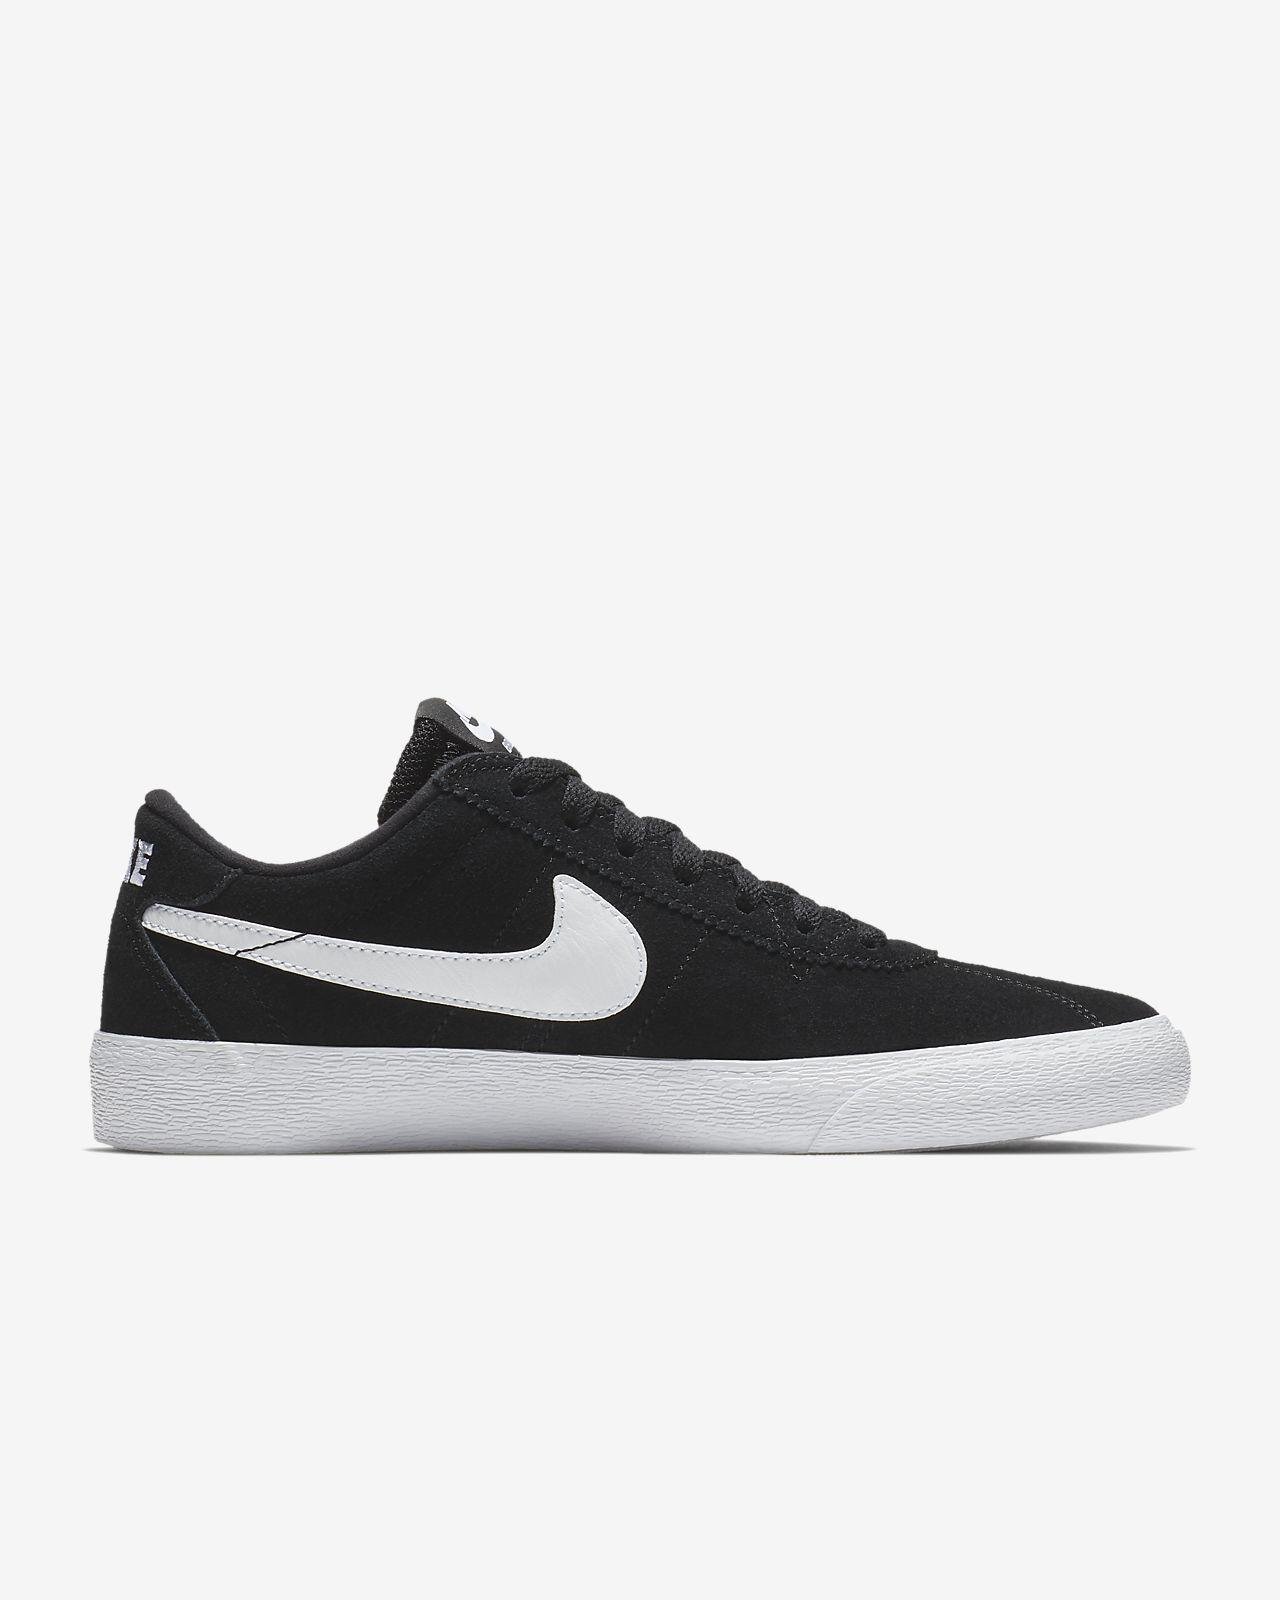 sale retailer 82200 19b7e ... Nike SB Zoom Bruin Low Women s Skateboarding Shoe